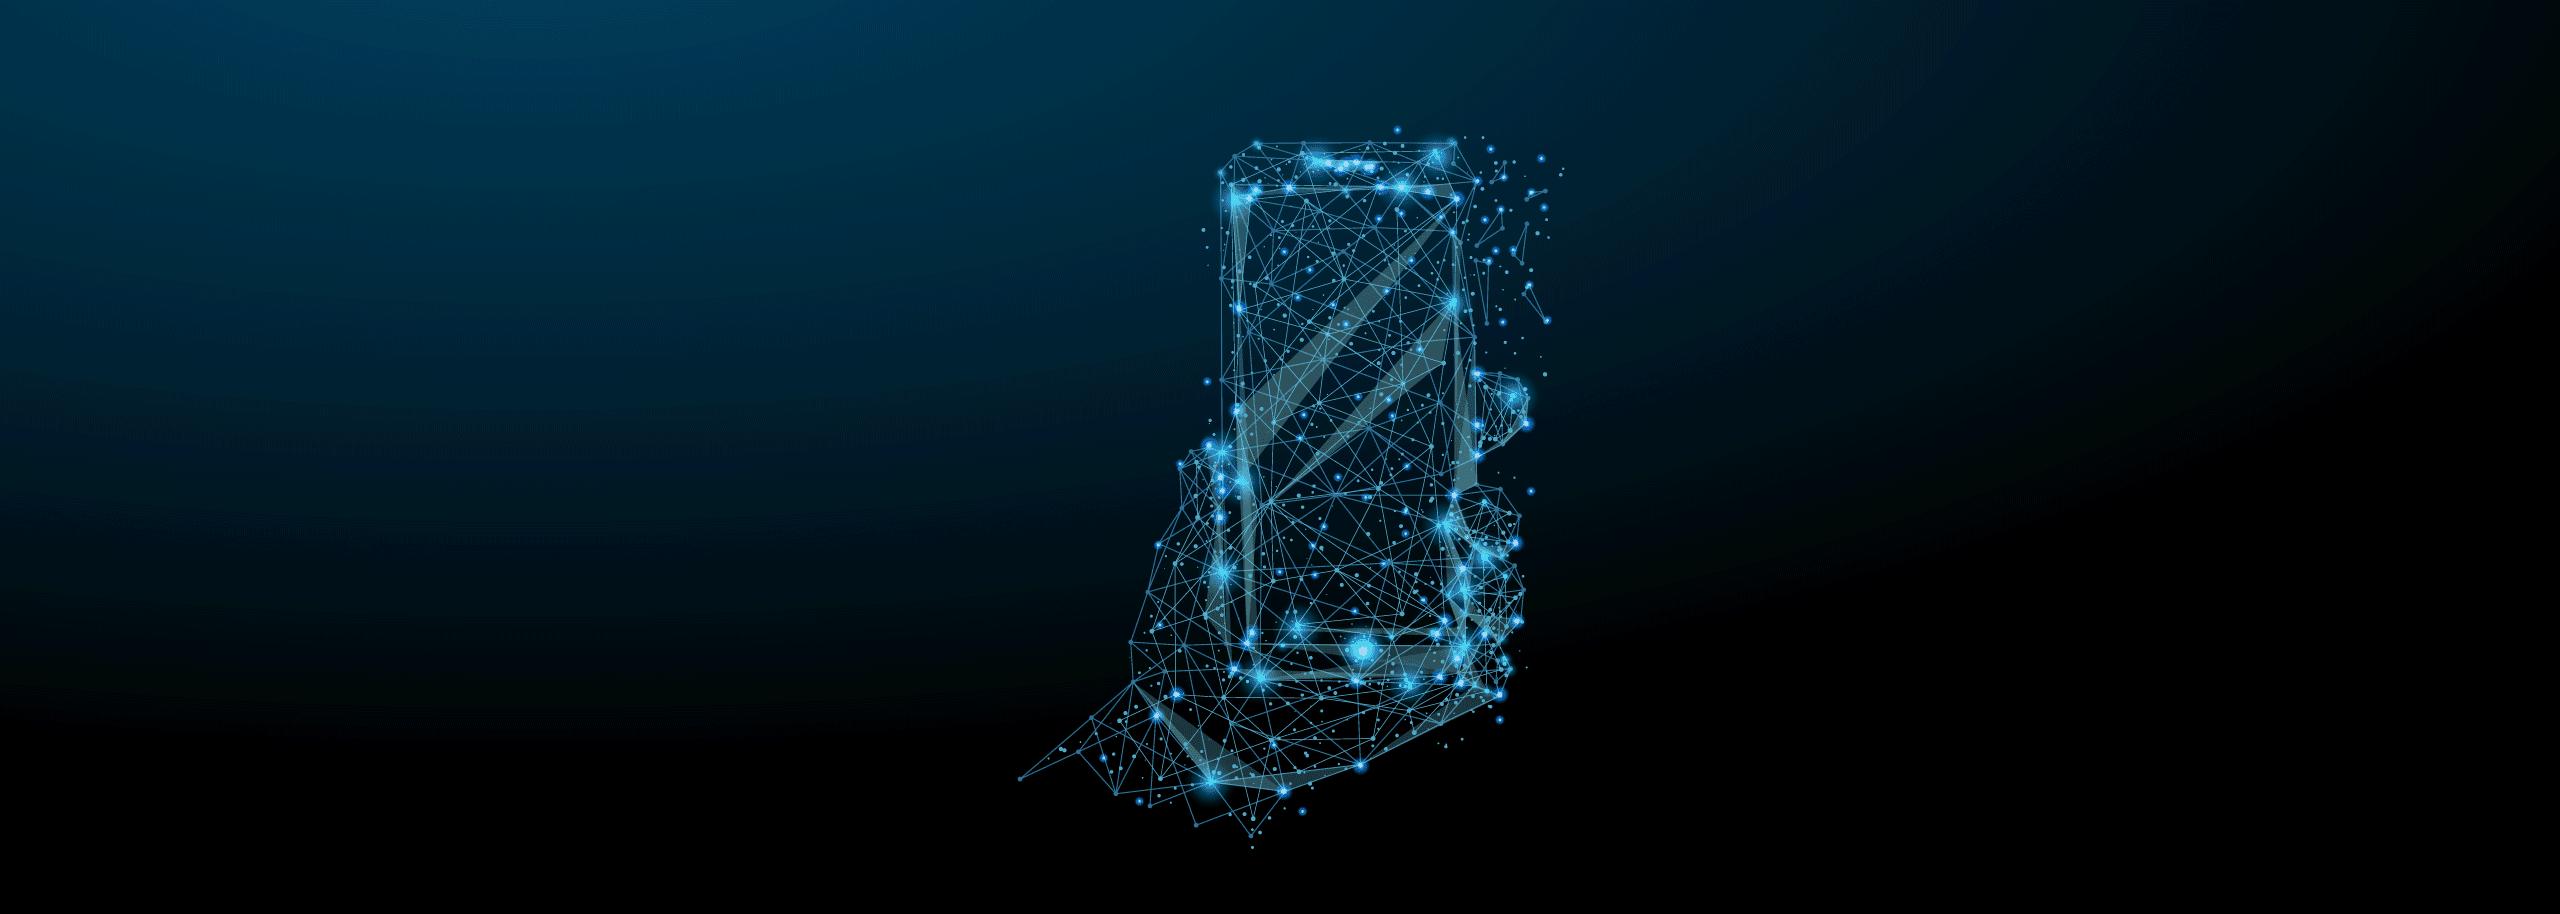 Mobile Shipment Tracking App for a Logistics Company